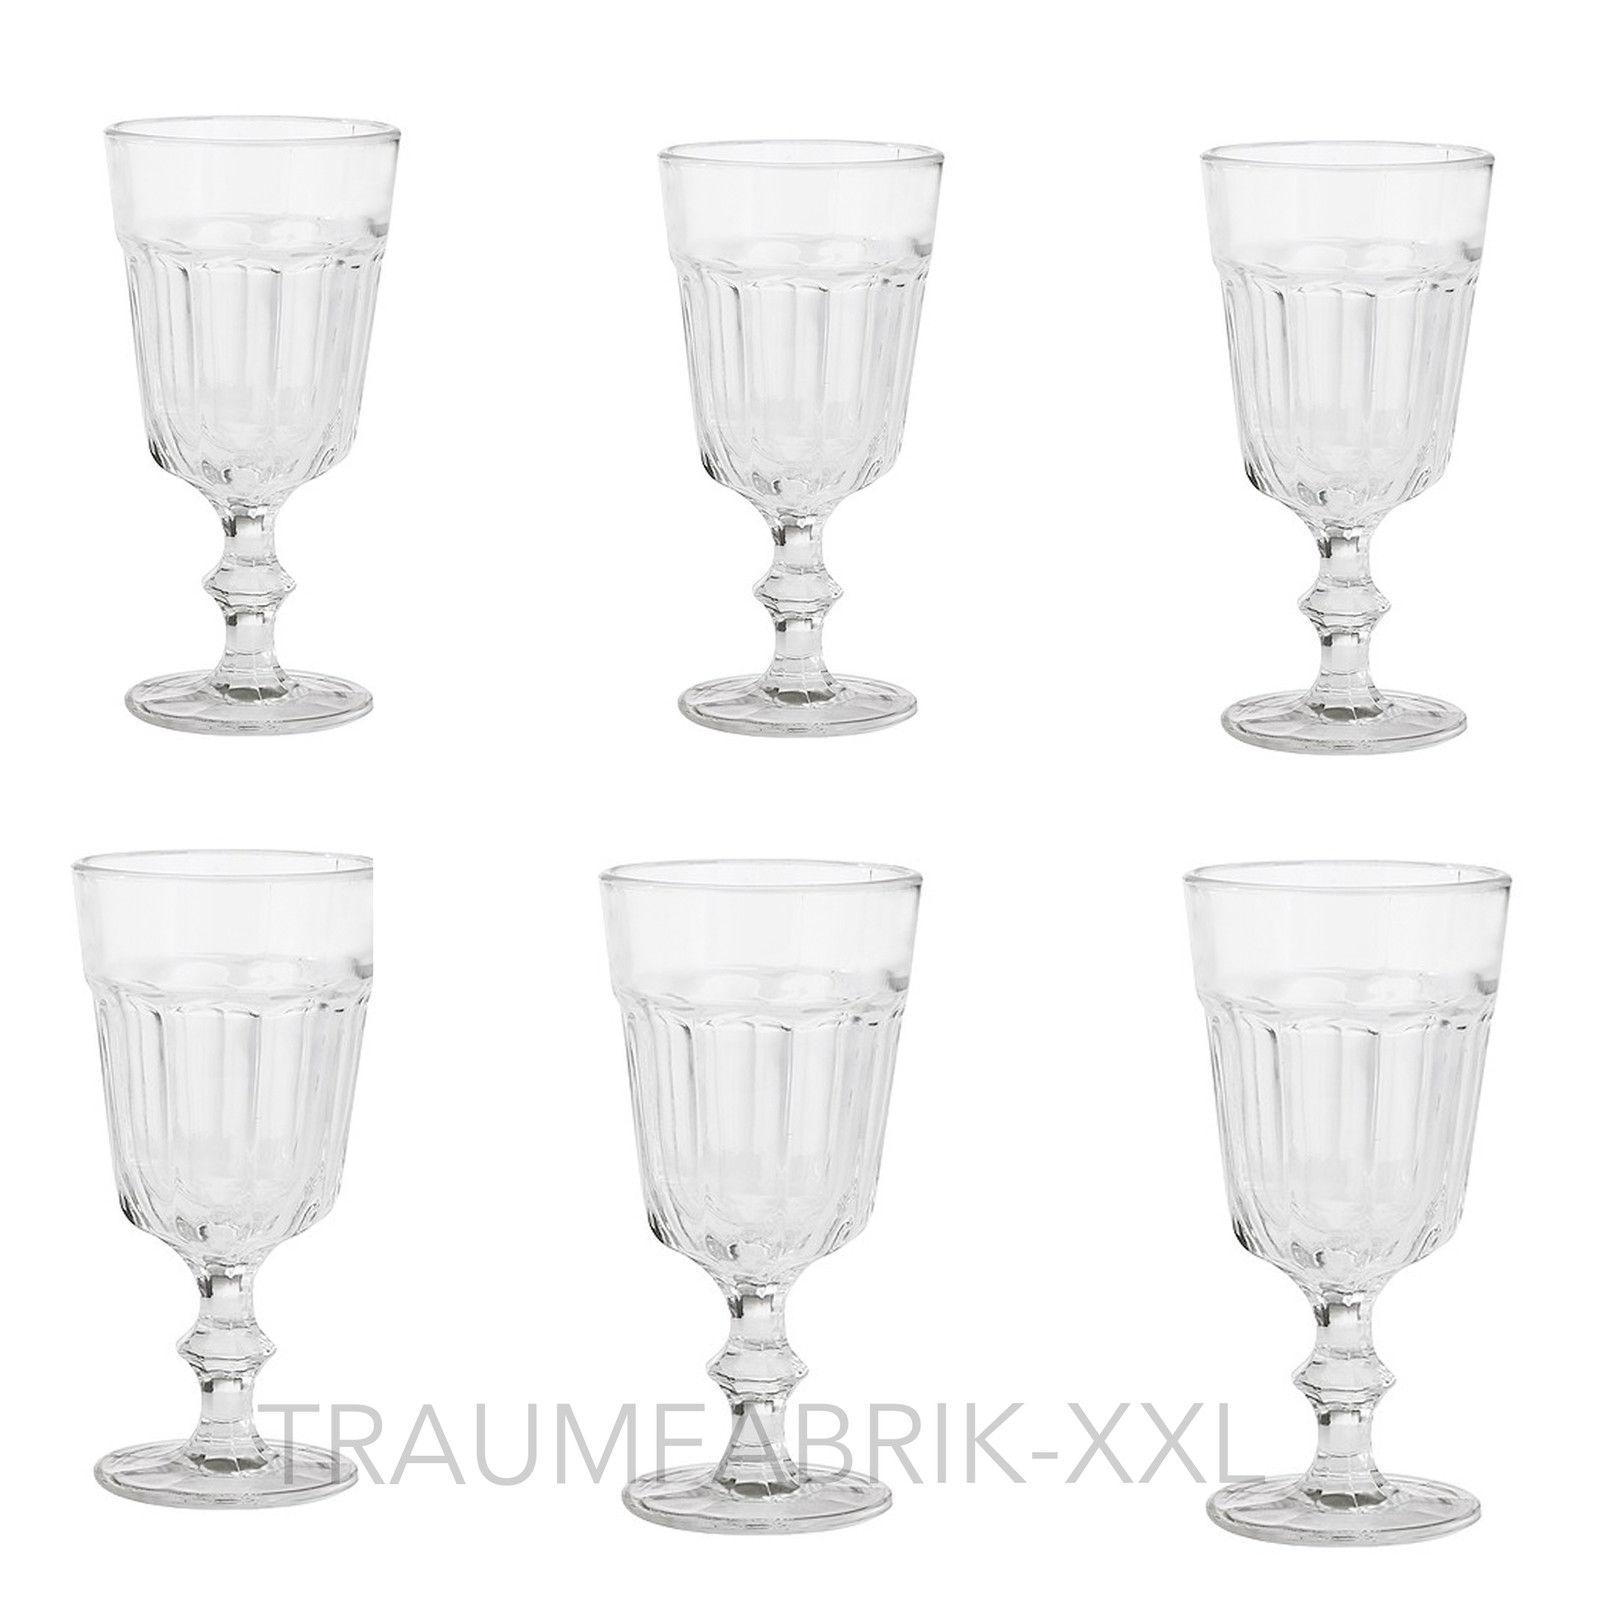 6 x weinglas weingl ser glas wasserglas dessertglas. Black Bedroom Furniture Sets. Home Design Ideas